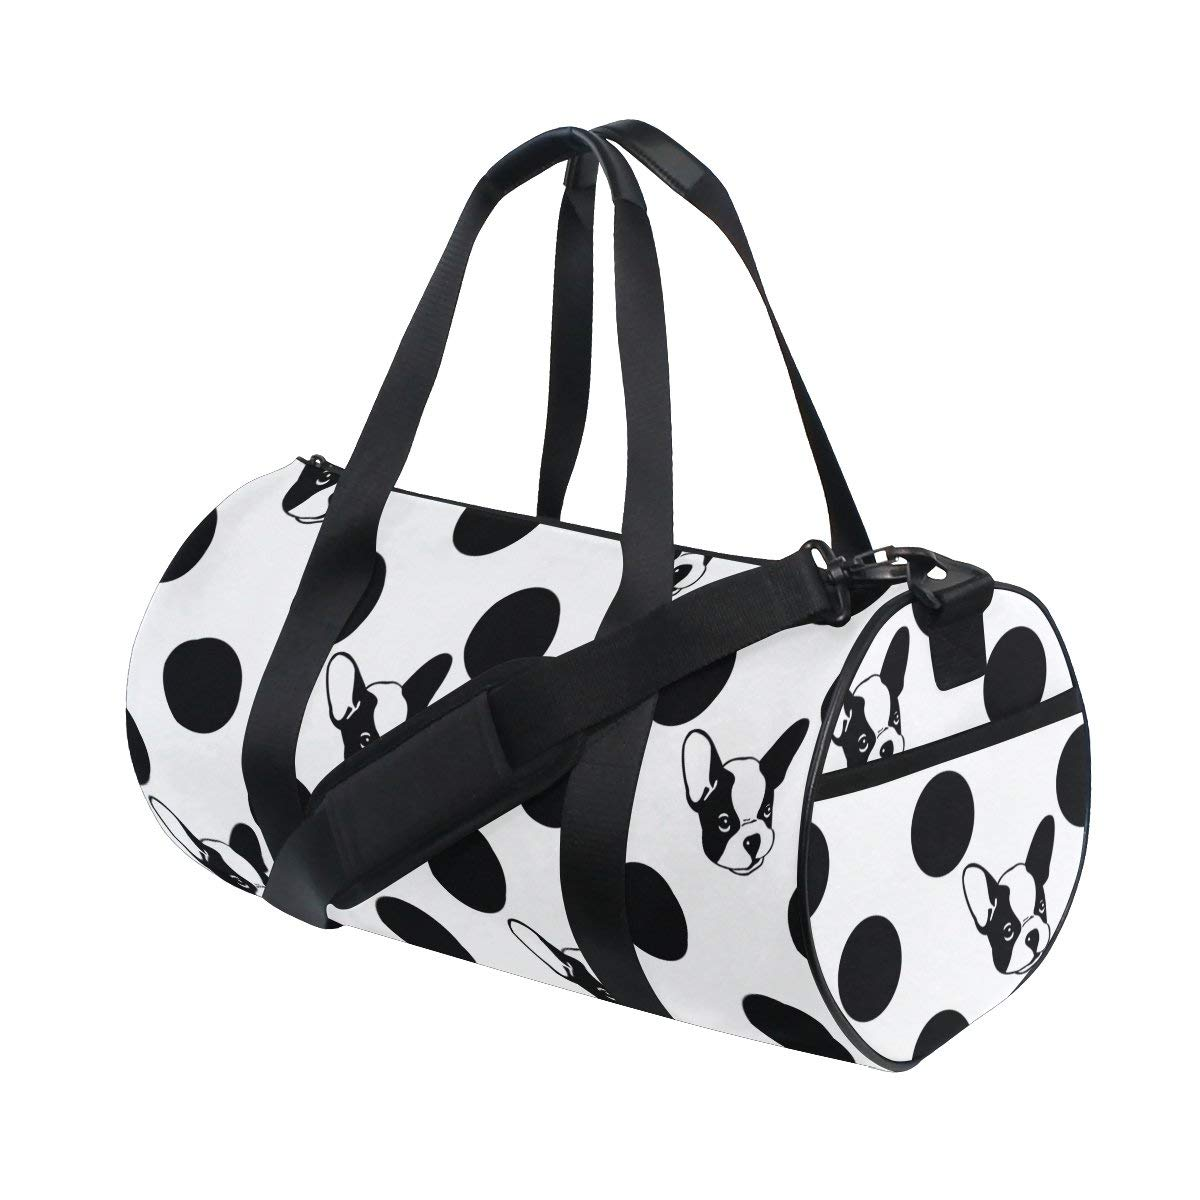 ac6c1751e9 ... Men Women Boys Girls Kids 25.99. Naanle Black And White French Bulldog  Dog Polka Dot Pattern Gym bag Sports Travel Duffle Bags